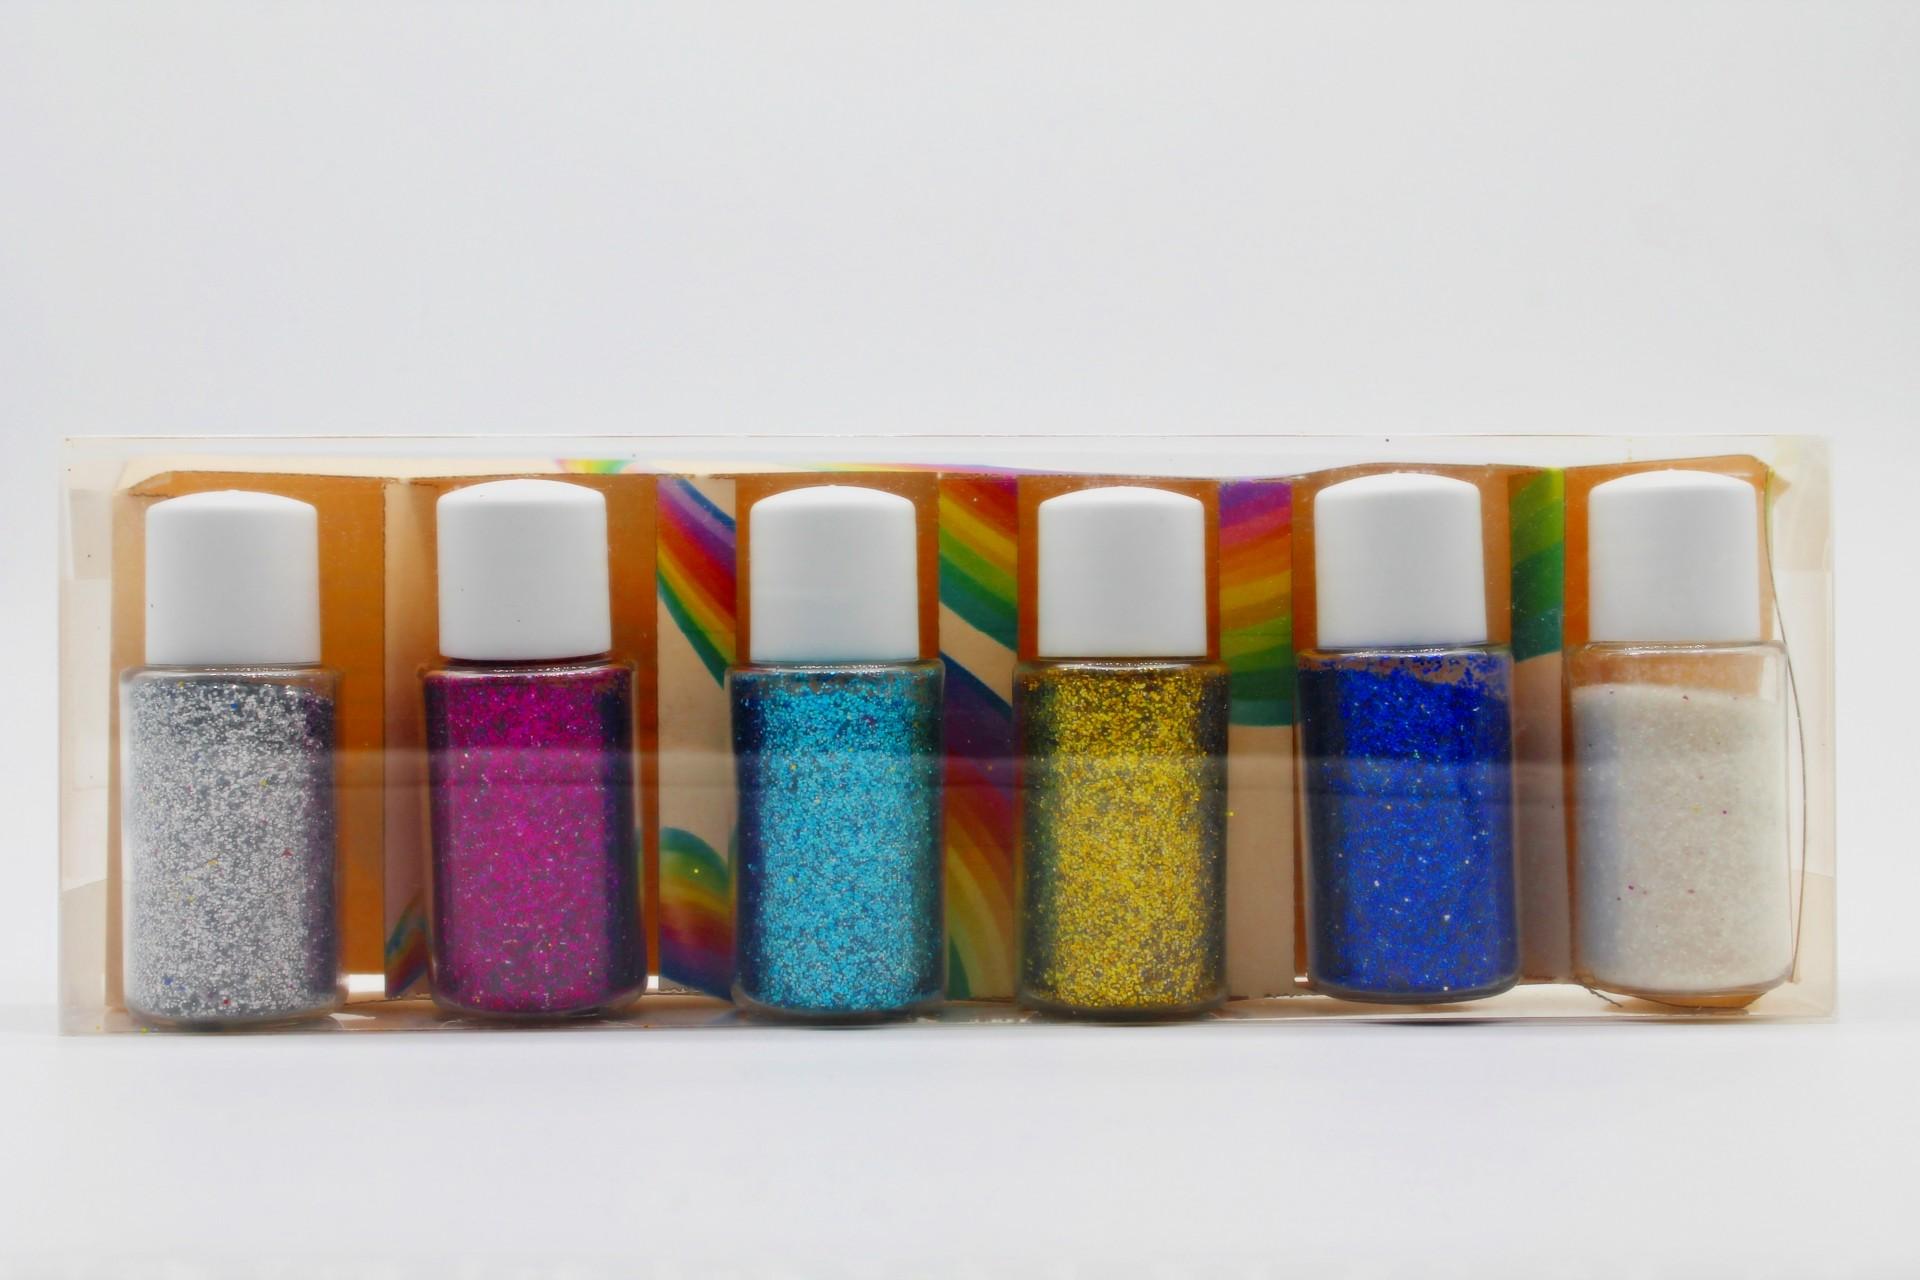 Kit Decoração de Slime - 6 Glitters